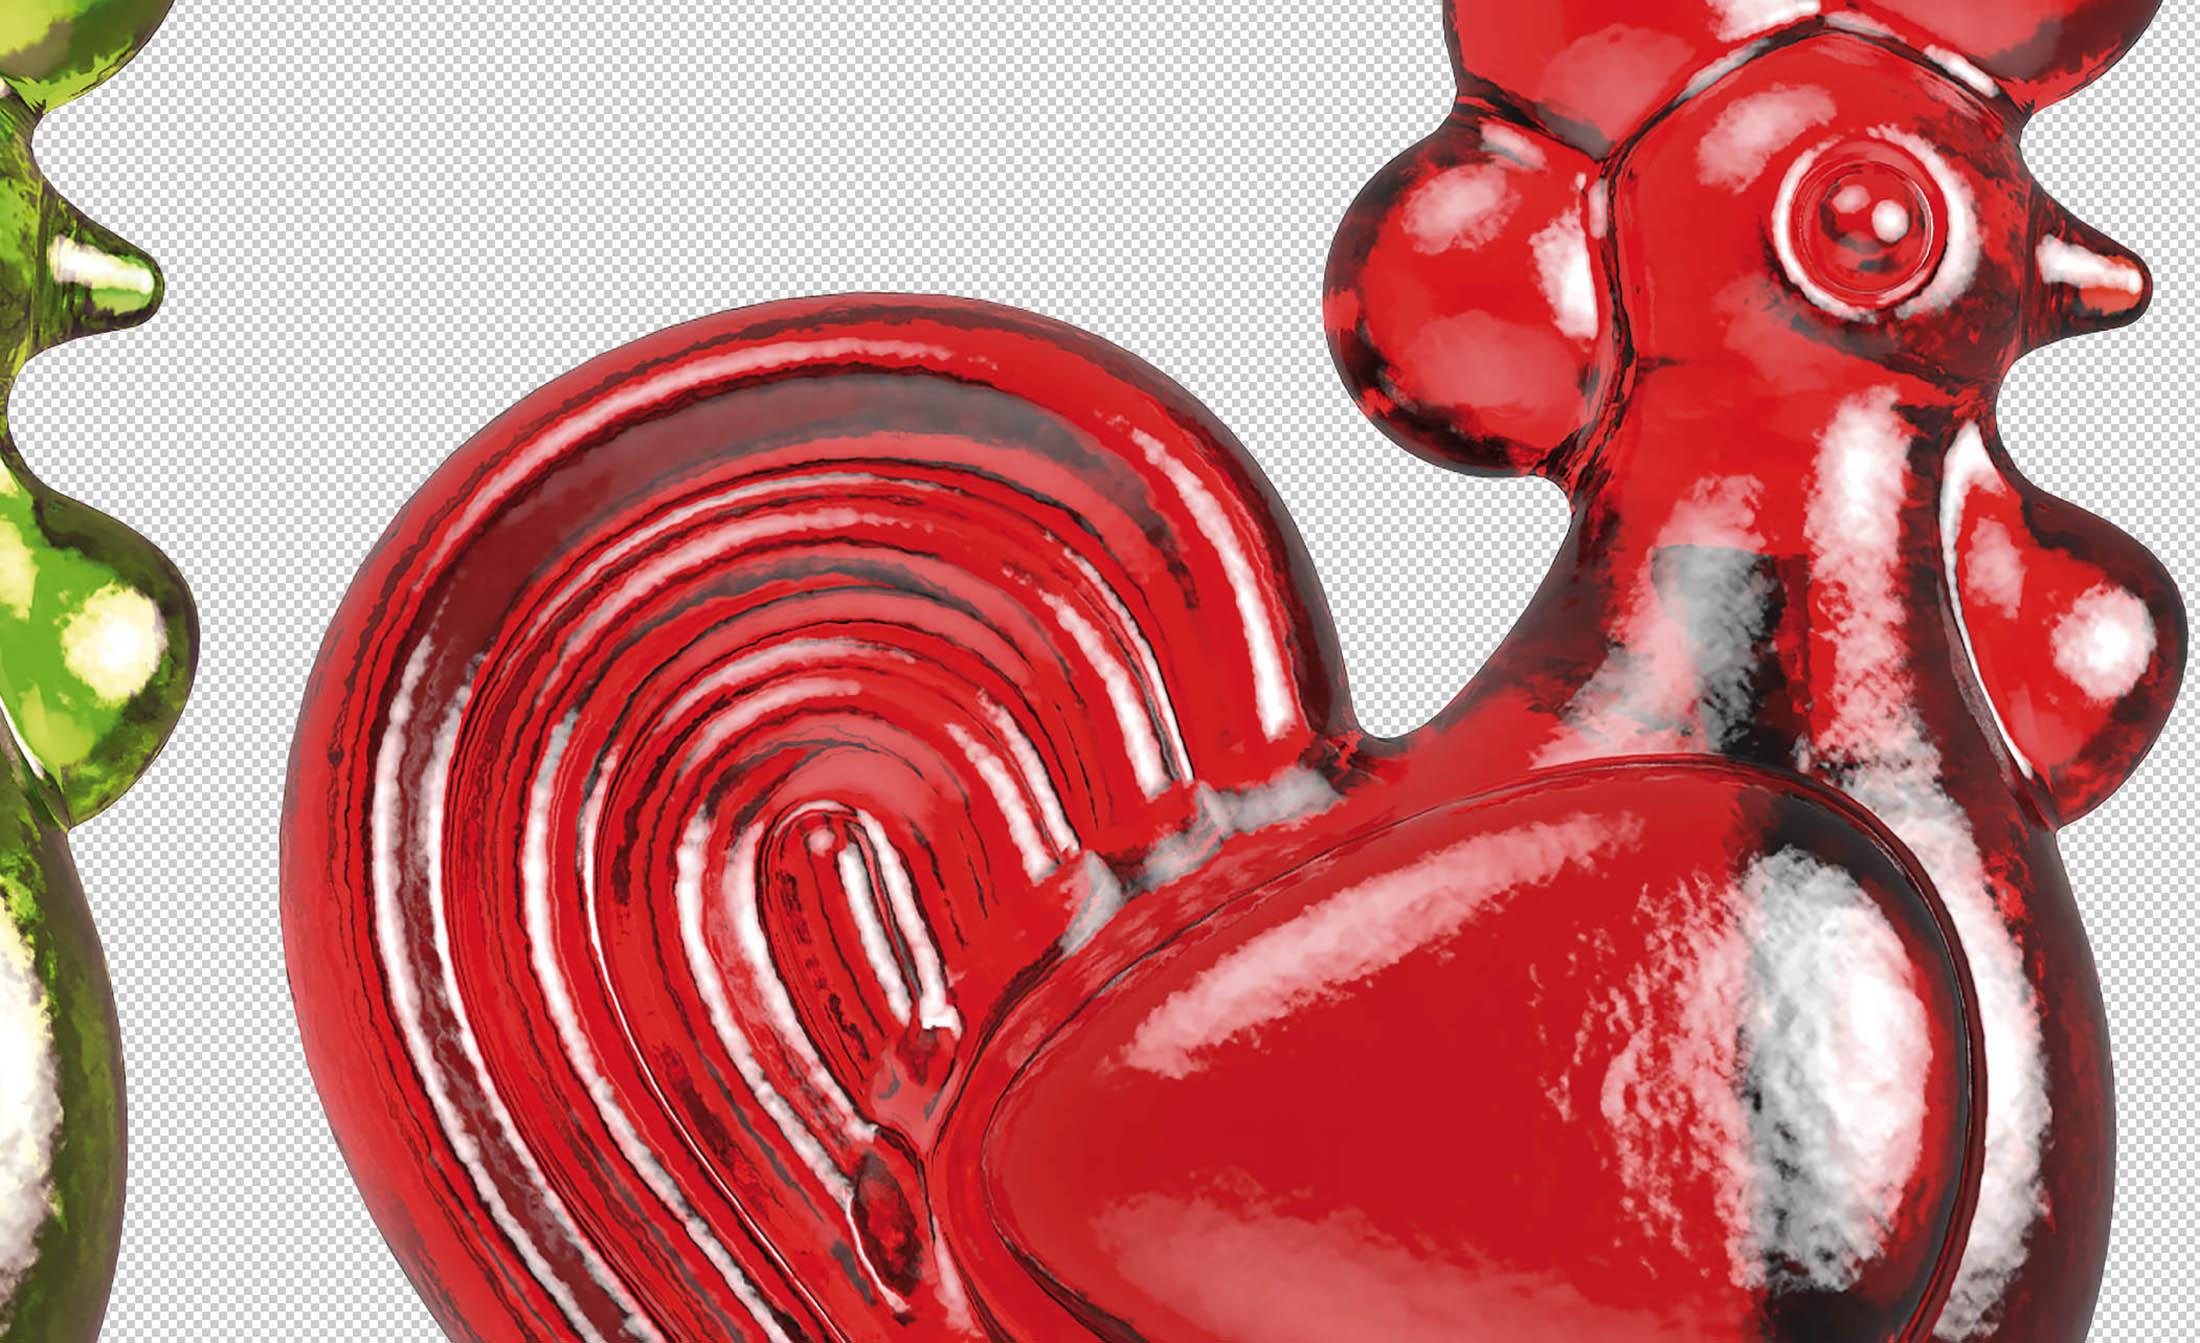 Cockerel candy example image 3